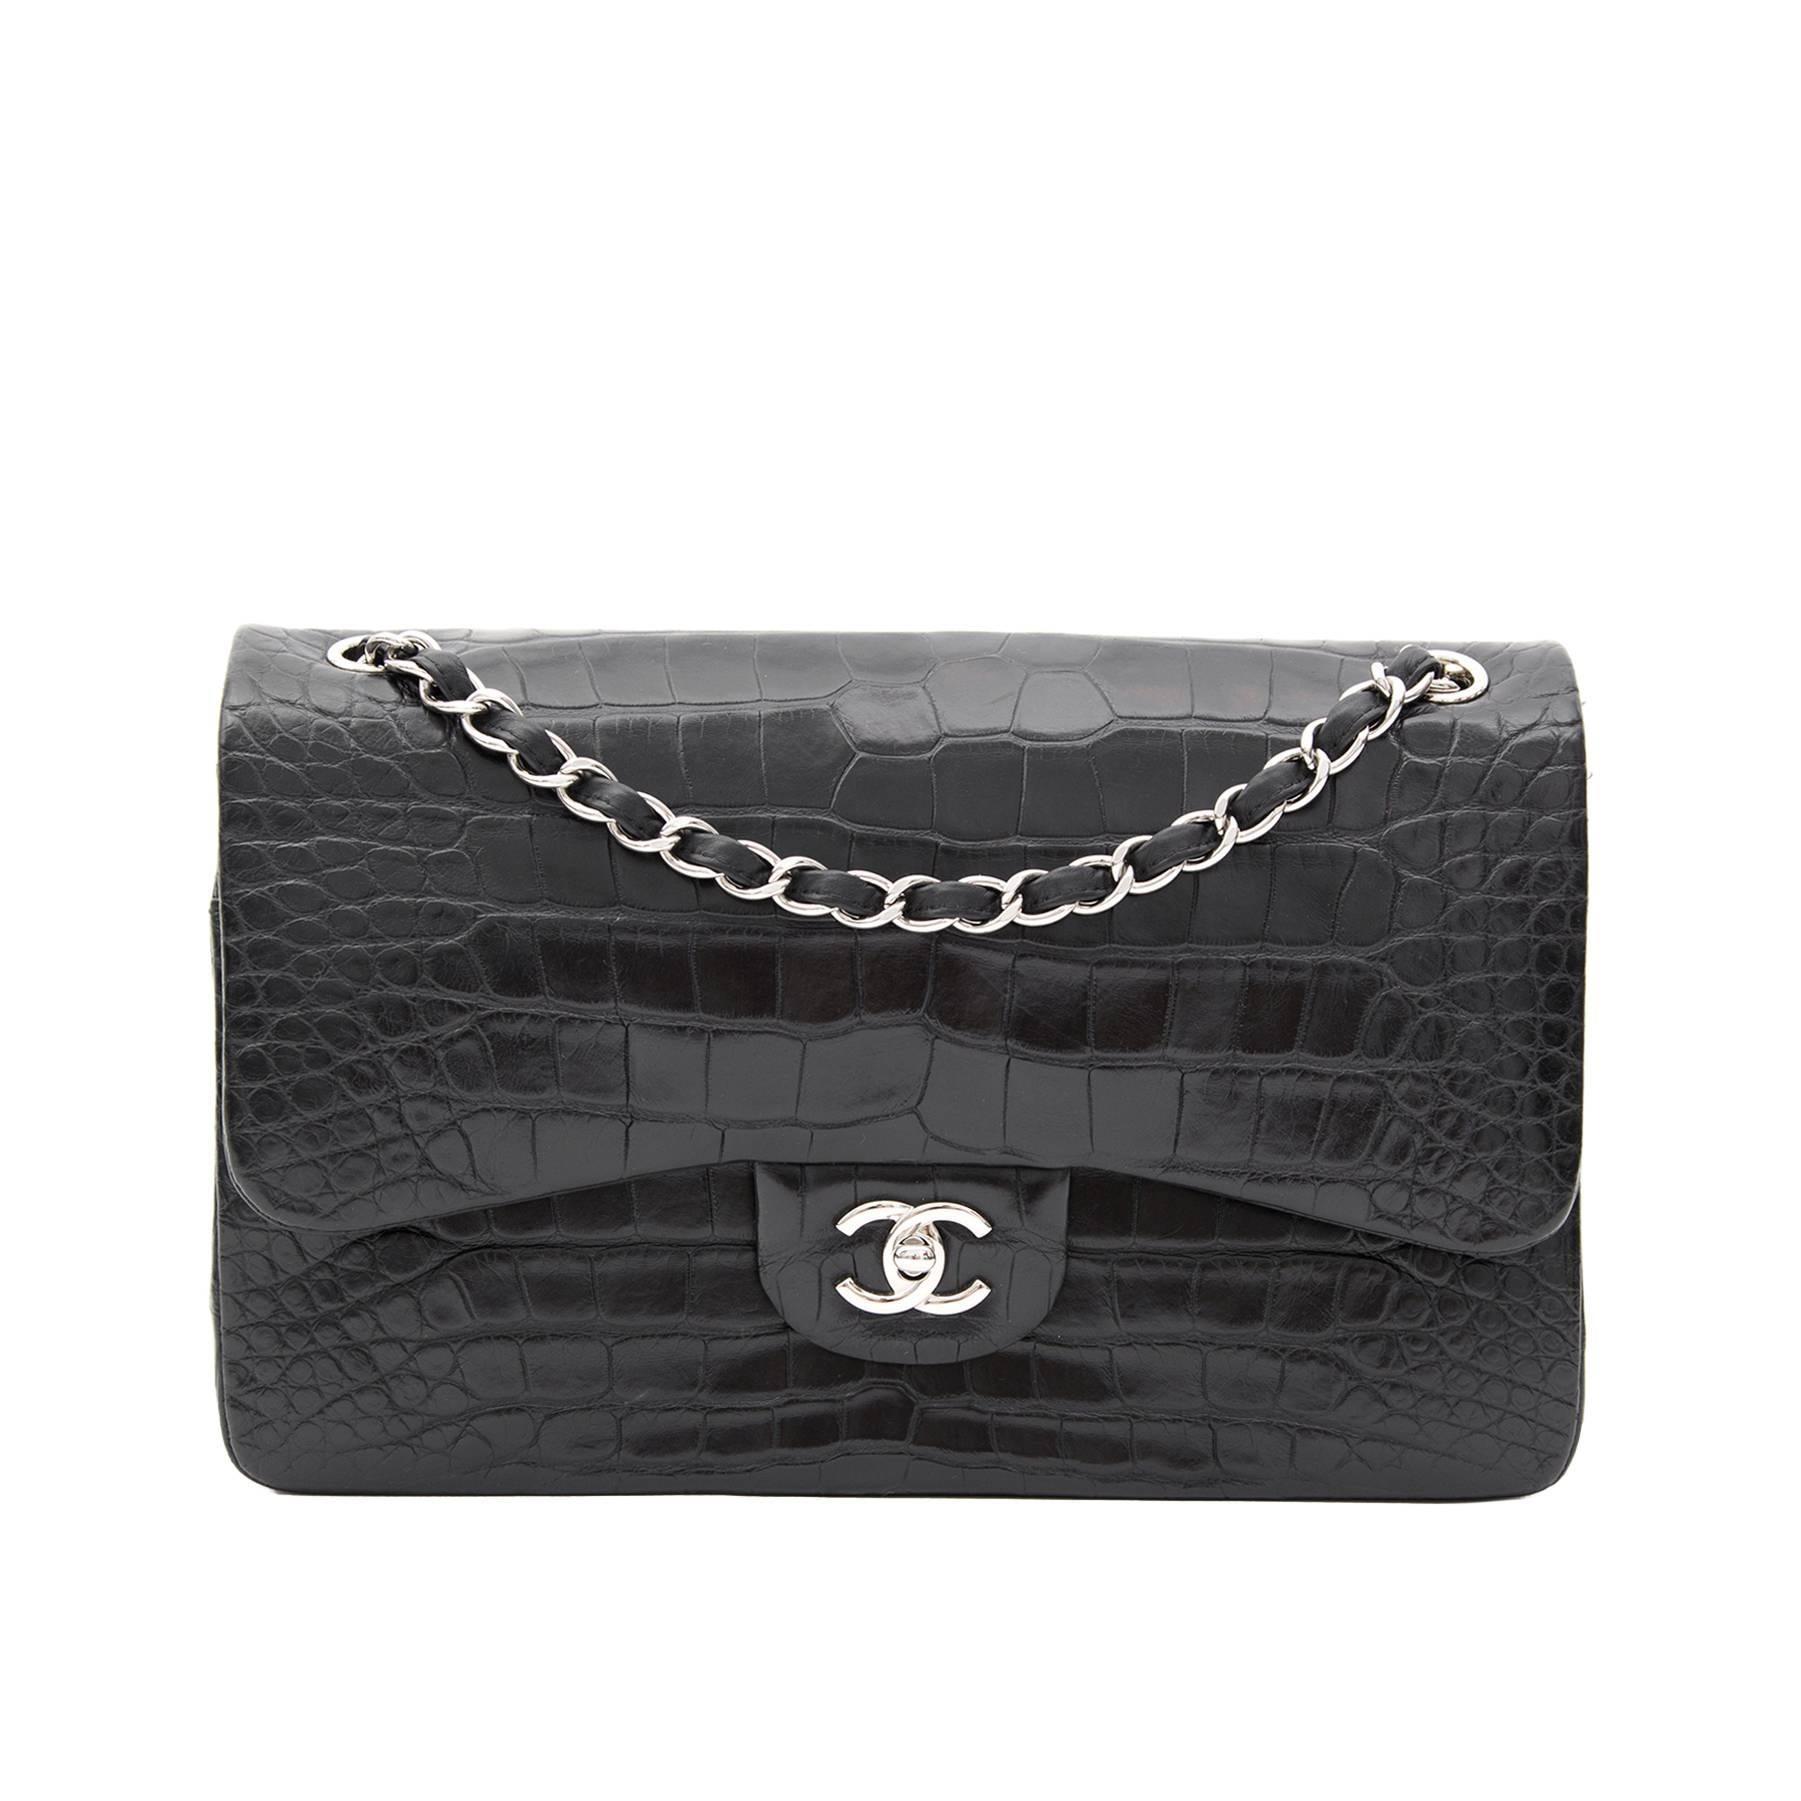 f3cf2c444296 Rare Chanel Alligator Jumbo Double Flap Black For Sale at 1stdibs